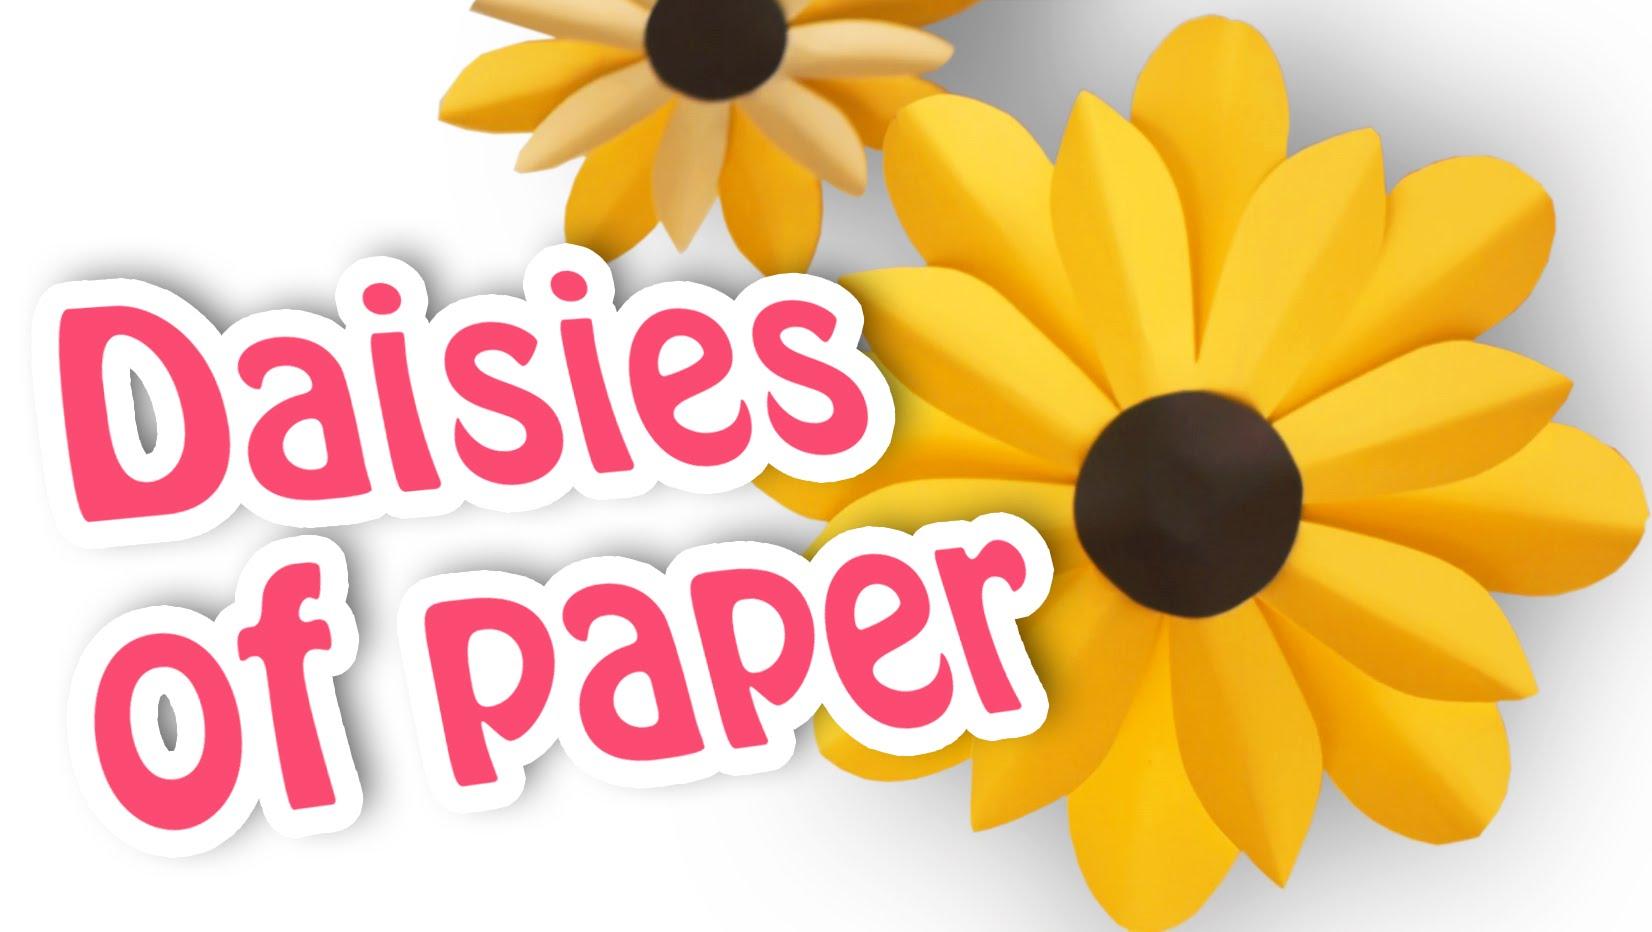 DIY crafts: PAPER FLOWERS daisies..